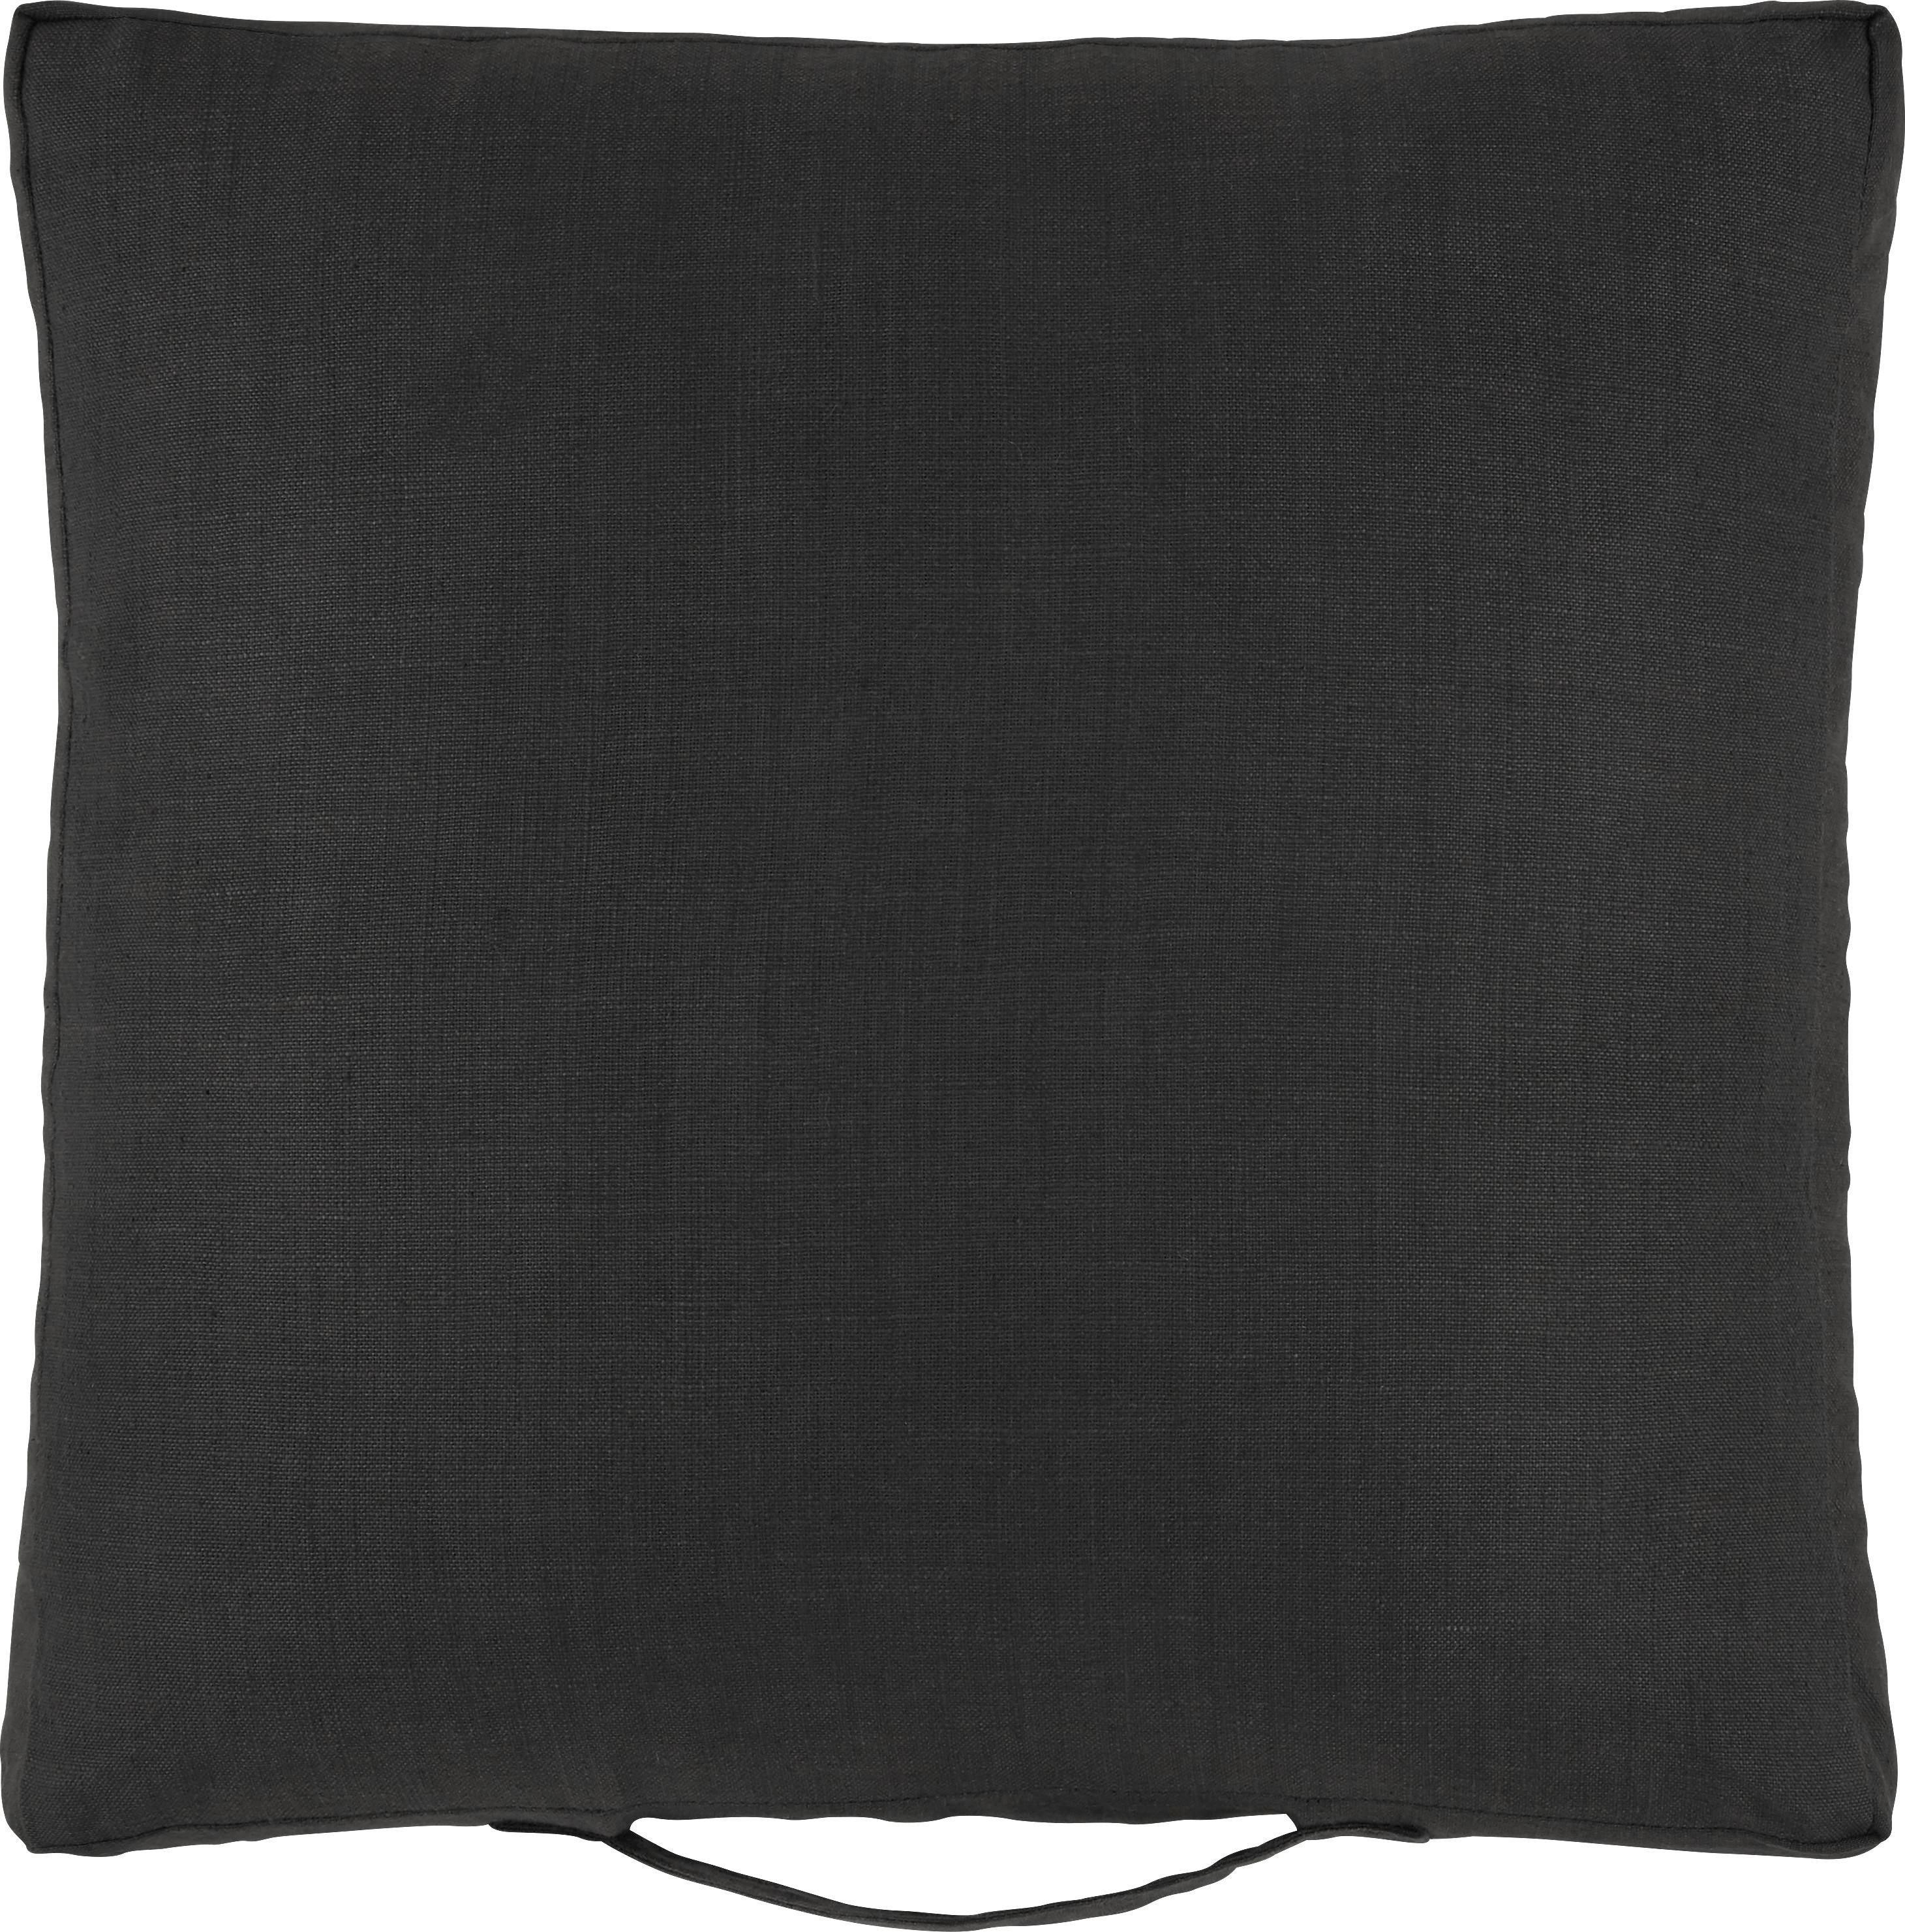 Polštář Urban - černá, Moderní, textil (45/45/5cm) - MÖMAX modern living